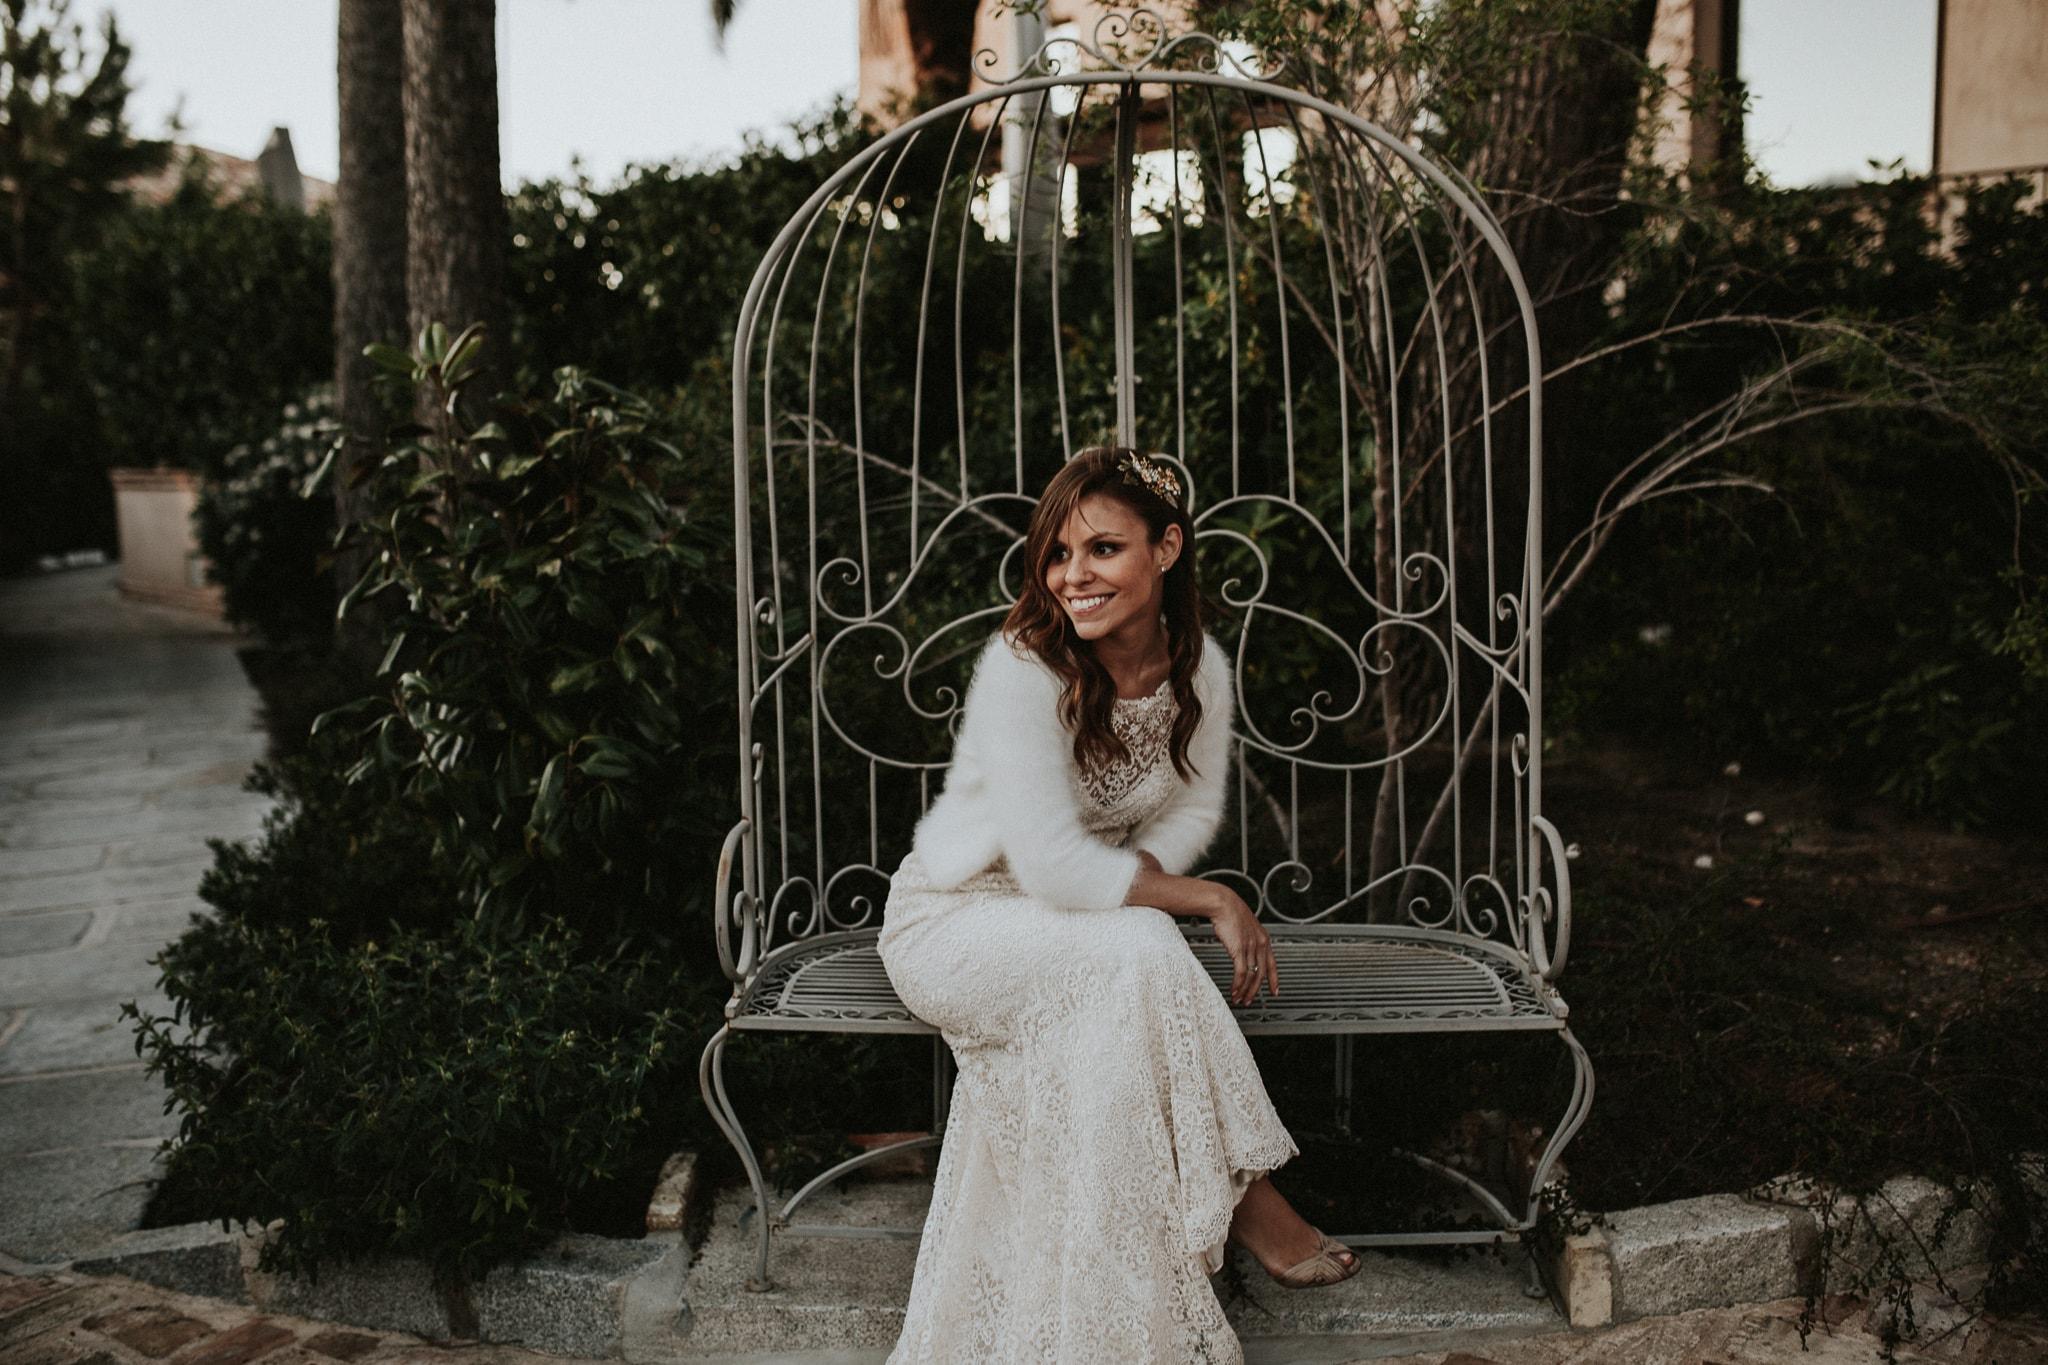 Fotografo-bodas-Cigarral-de-las-Mercedes-124